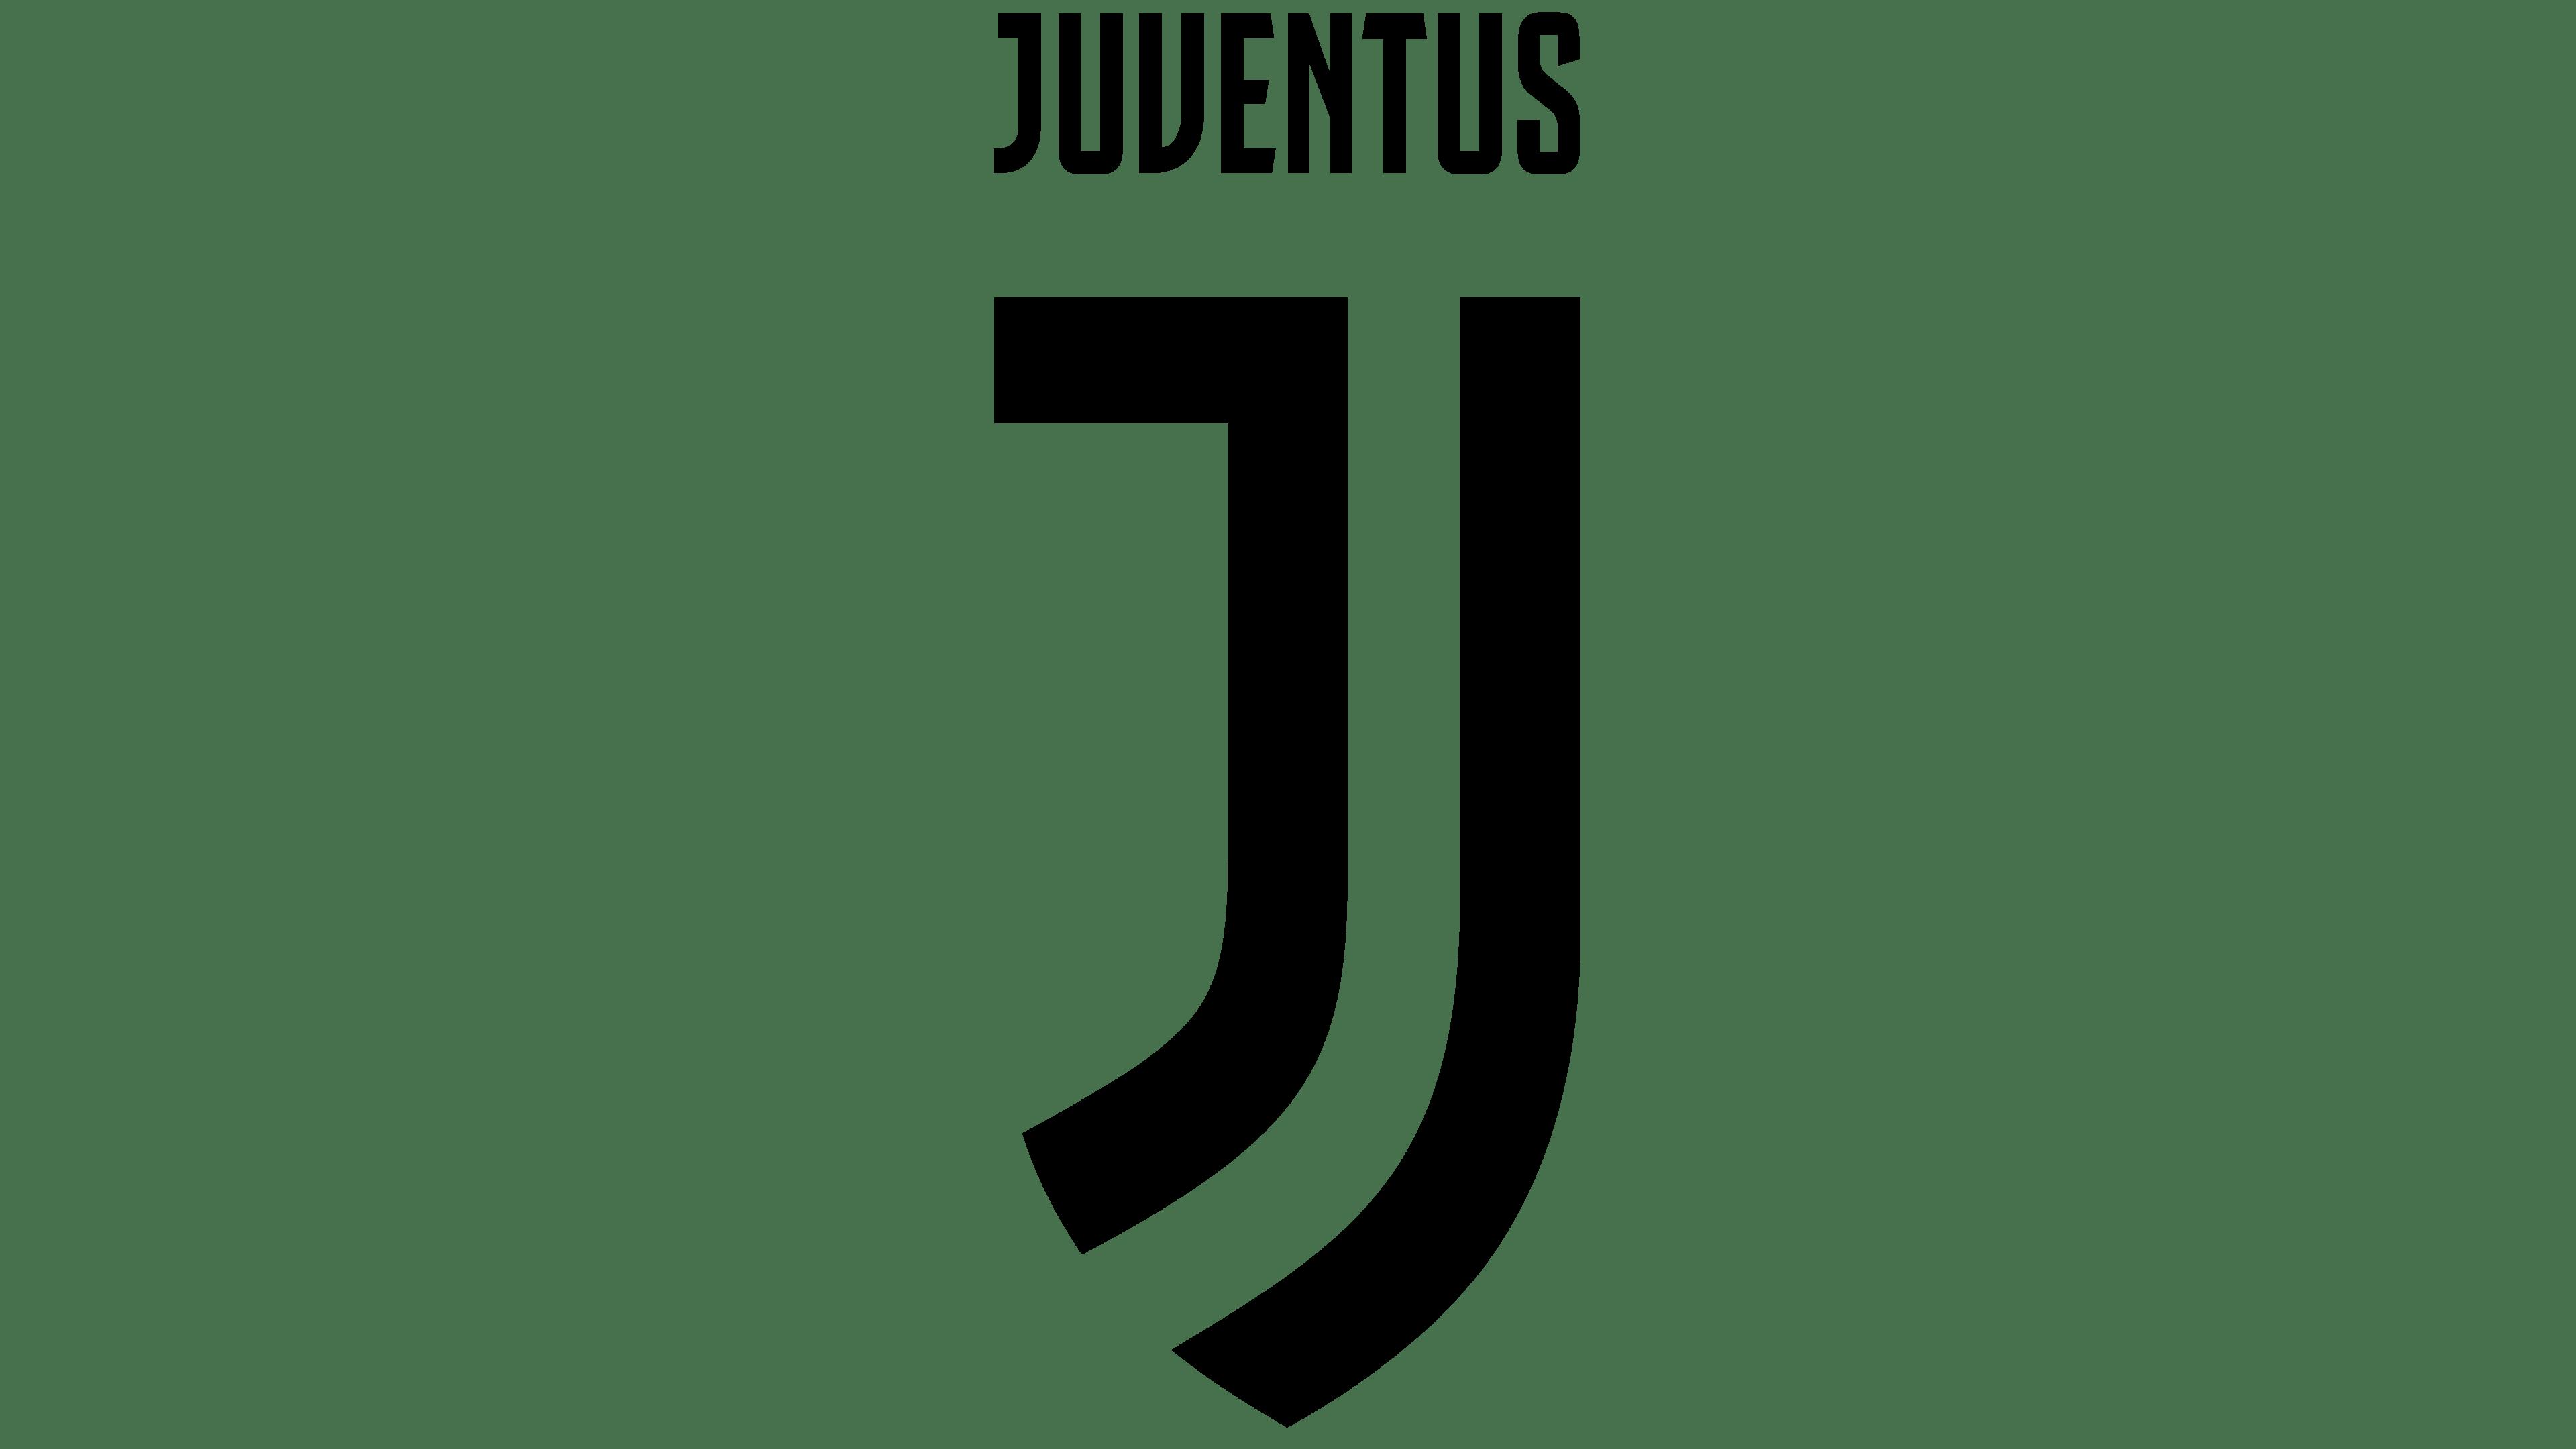 CALCIOMERCATO JUVENTUS 2018 2019